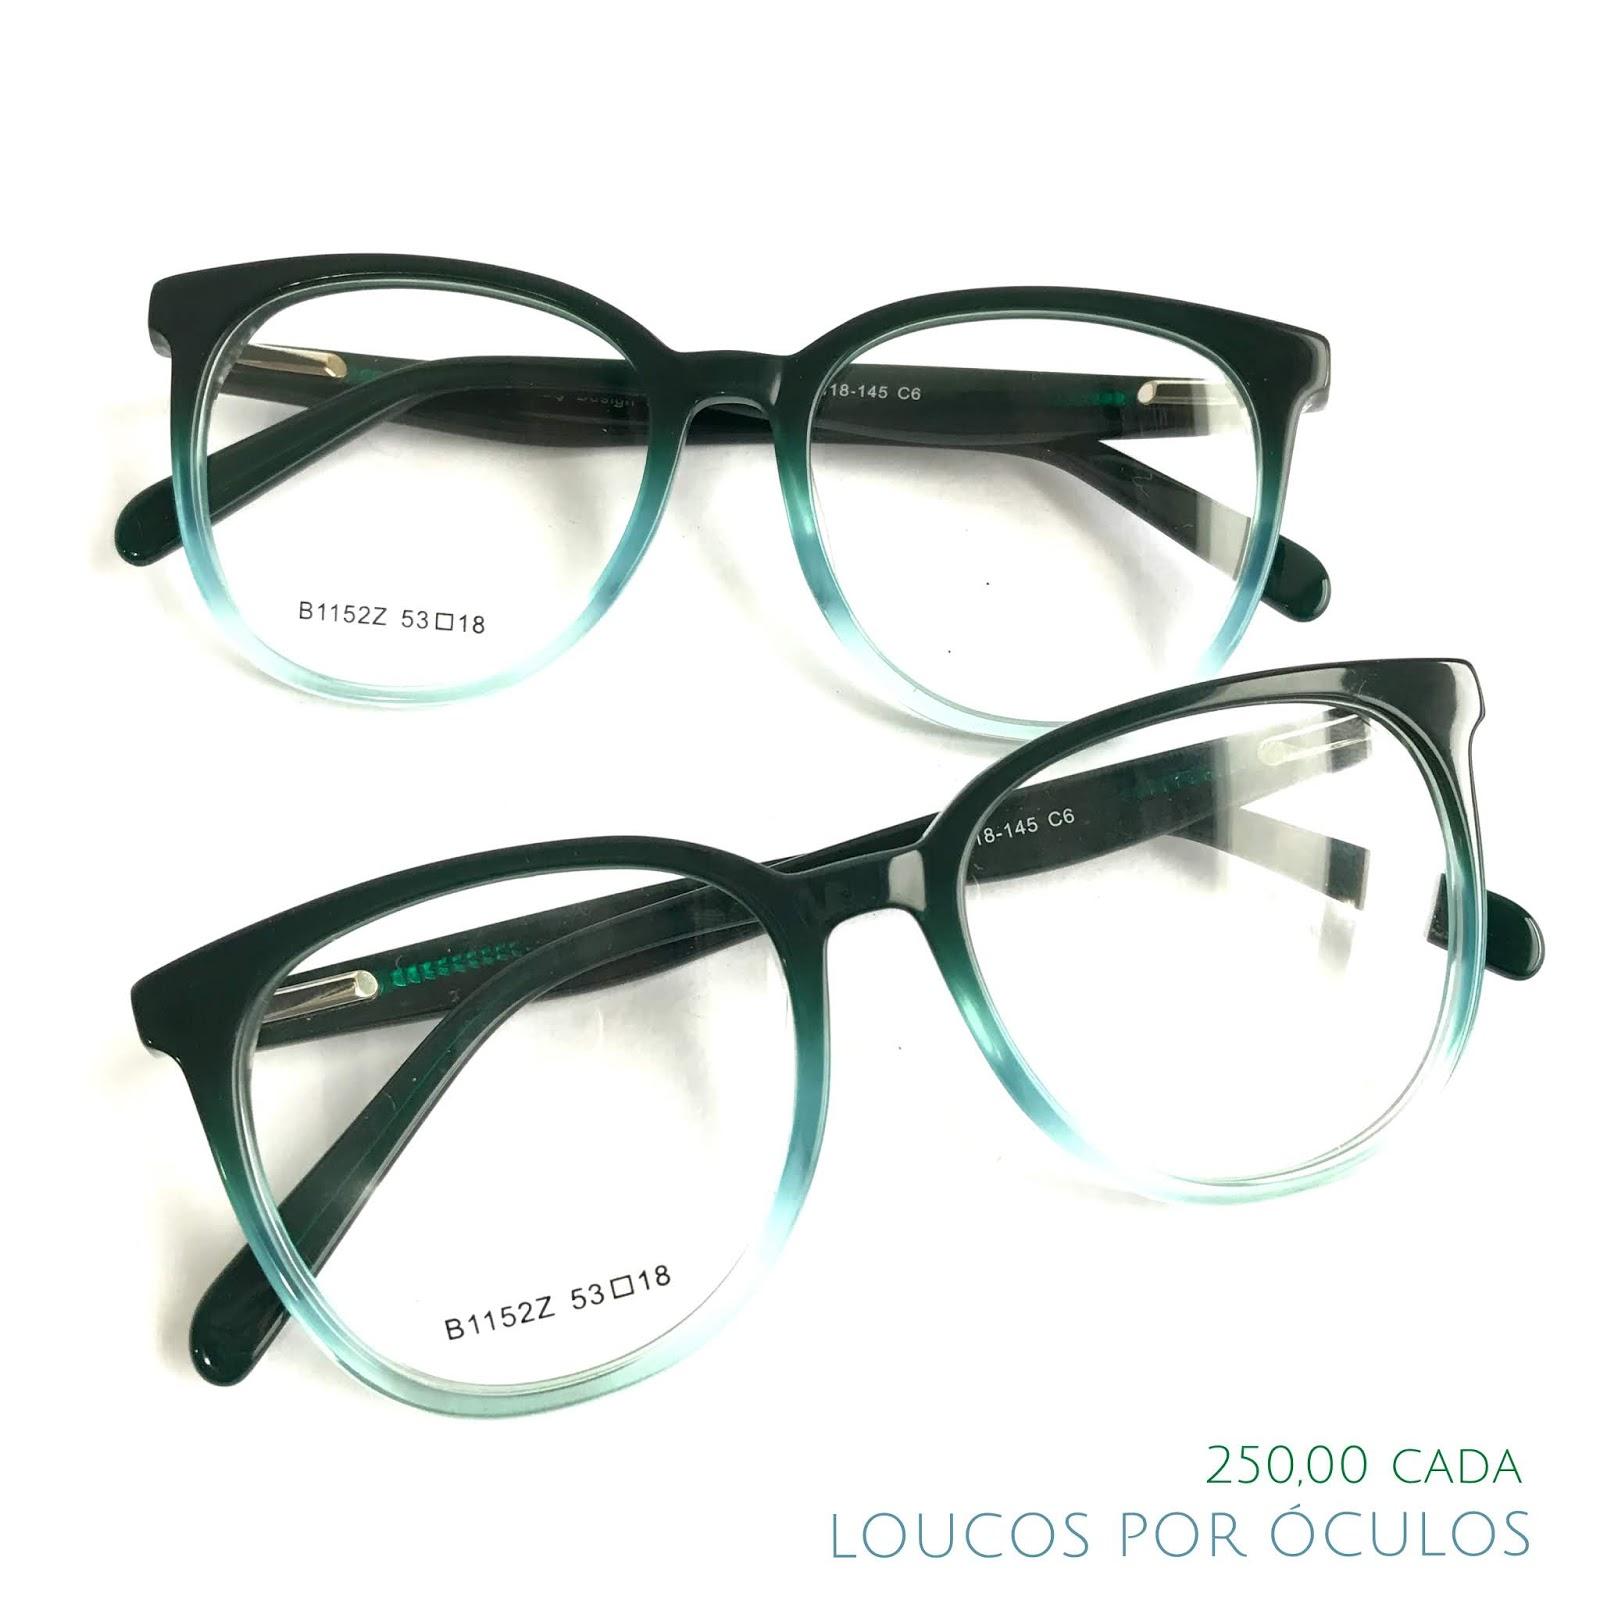 d3e578488ac8c Óculos colorido - Óculos redondo de acetato - Óculos retrô - Óculos preto -  Óculos básico - Óculos lindo - óculos barato - Óculos estiloso - óculos  perfeito ...